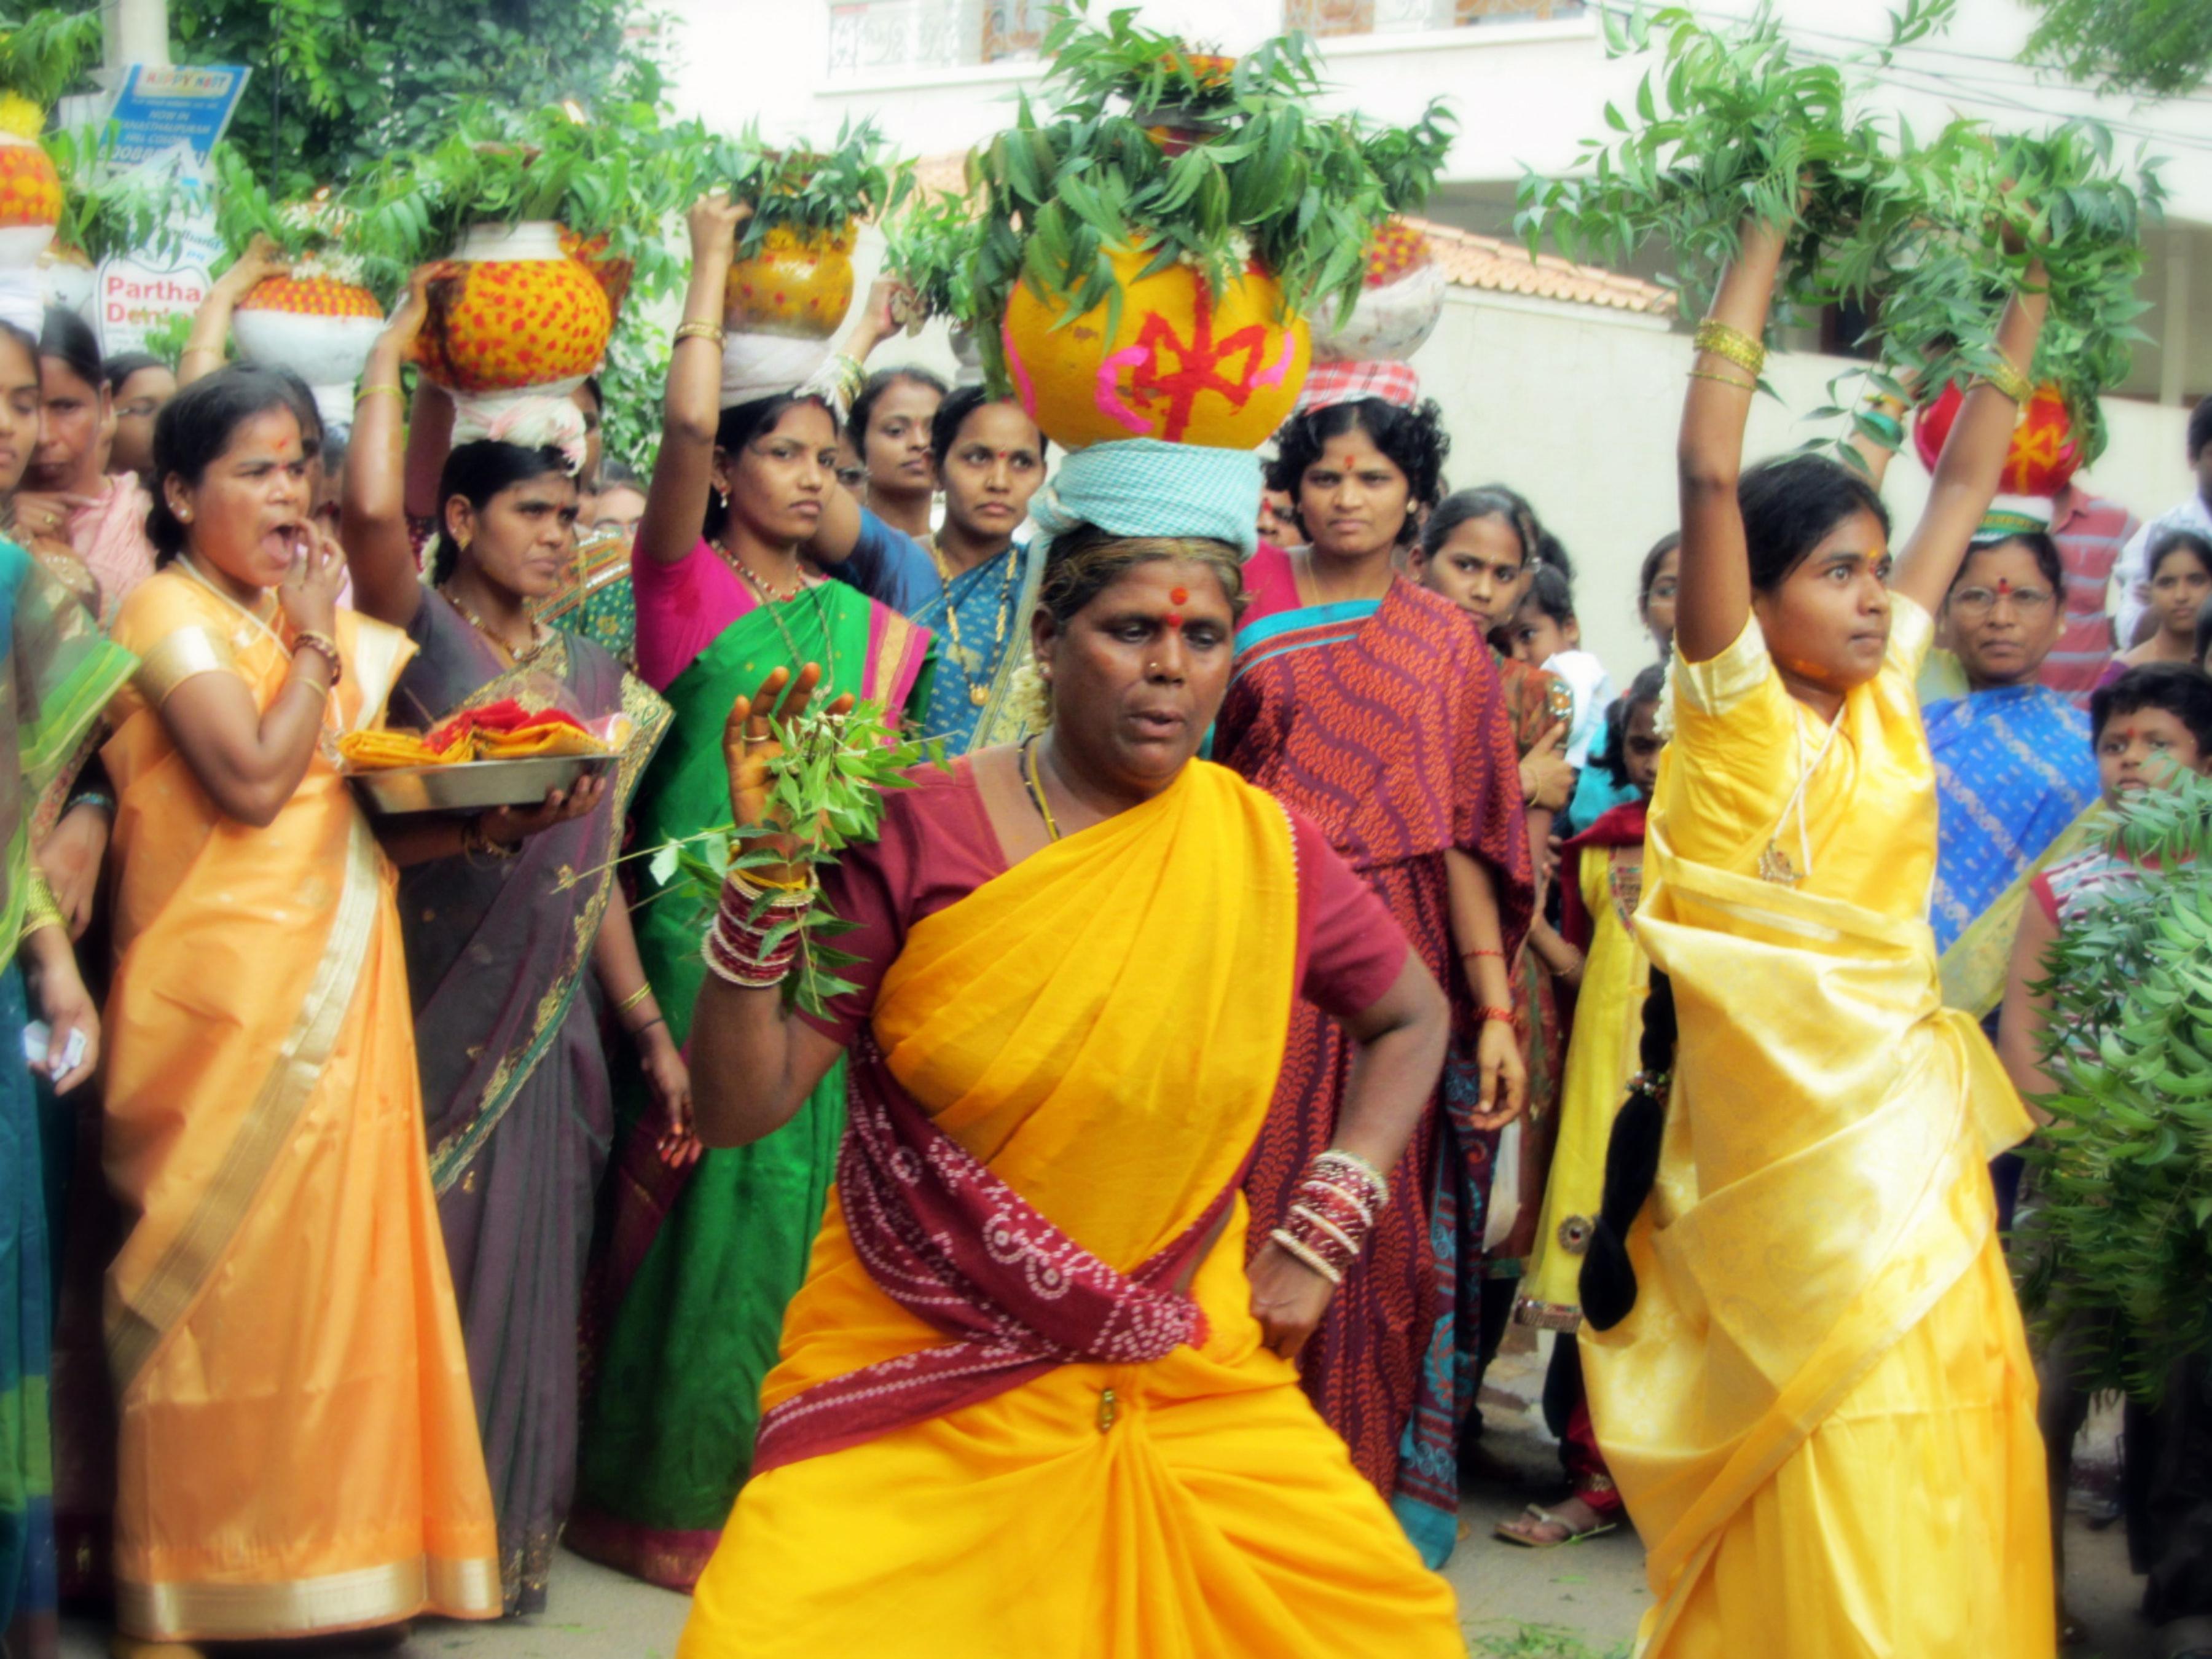 India's 'Temple Slaves' Struggle to Break Free | Inter Press